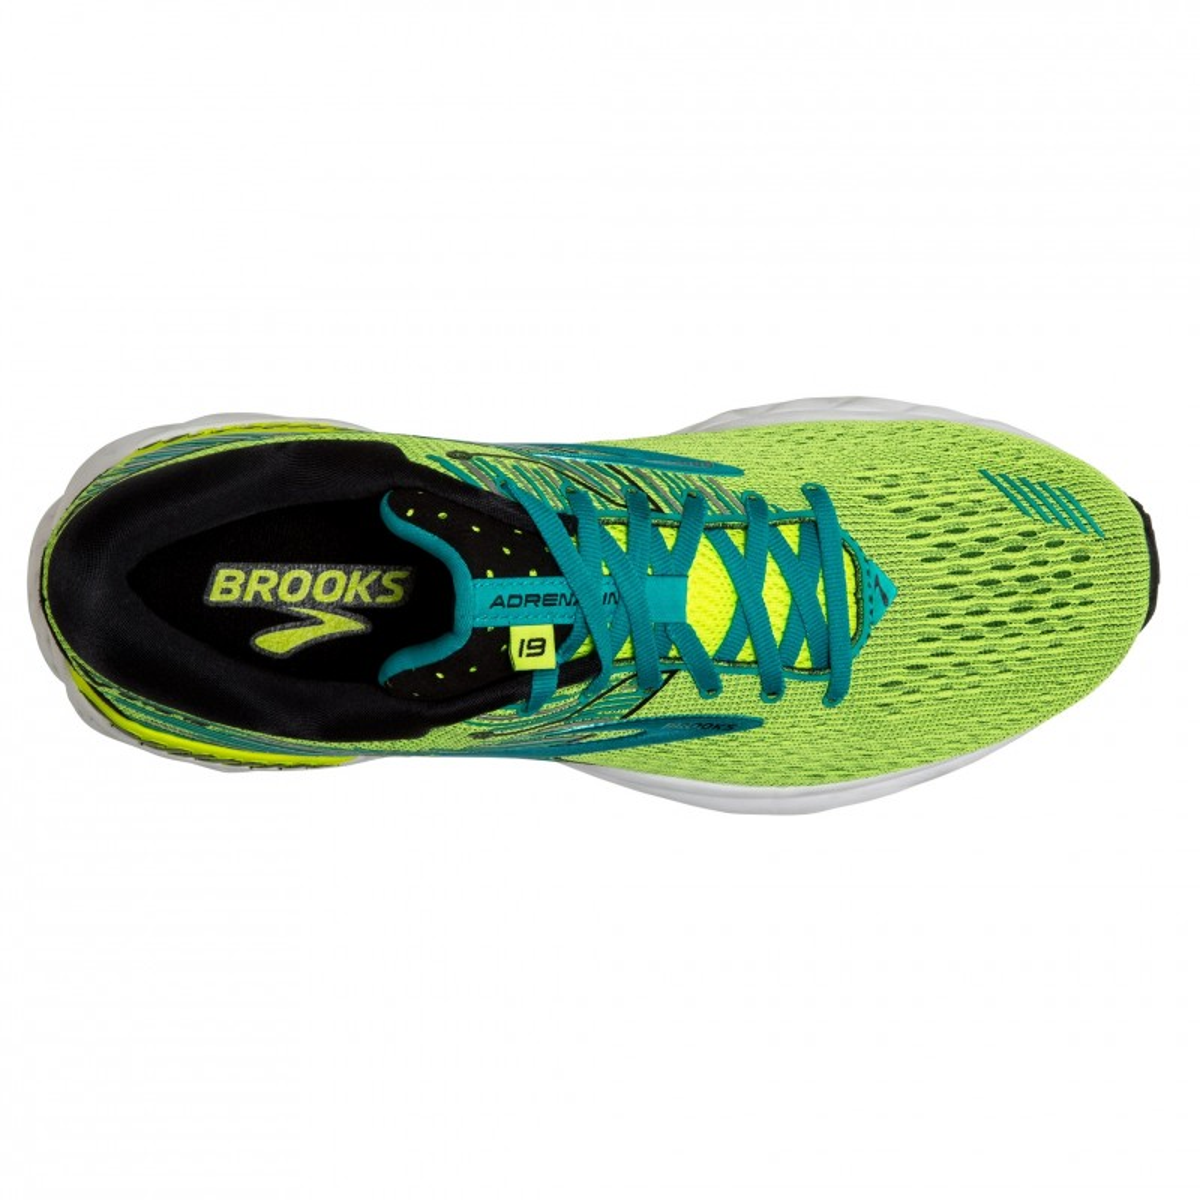 Brooks Adrenaline GTS 19 Yellow AW19